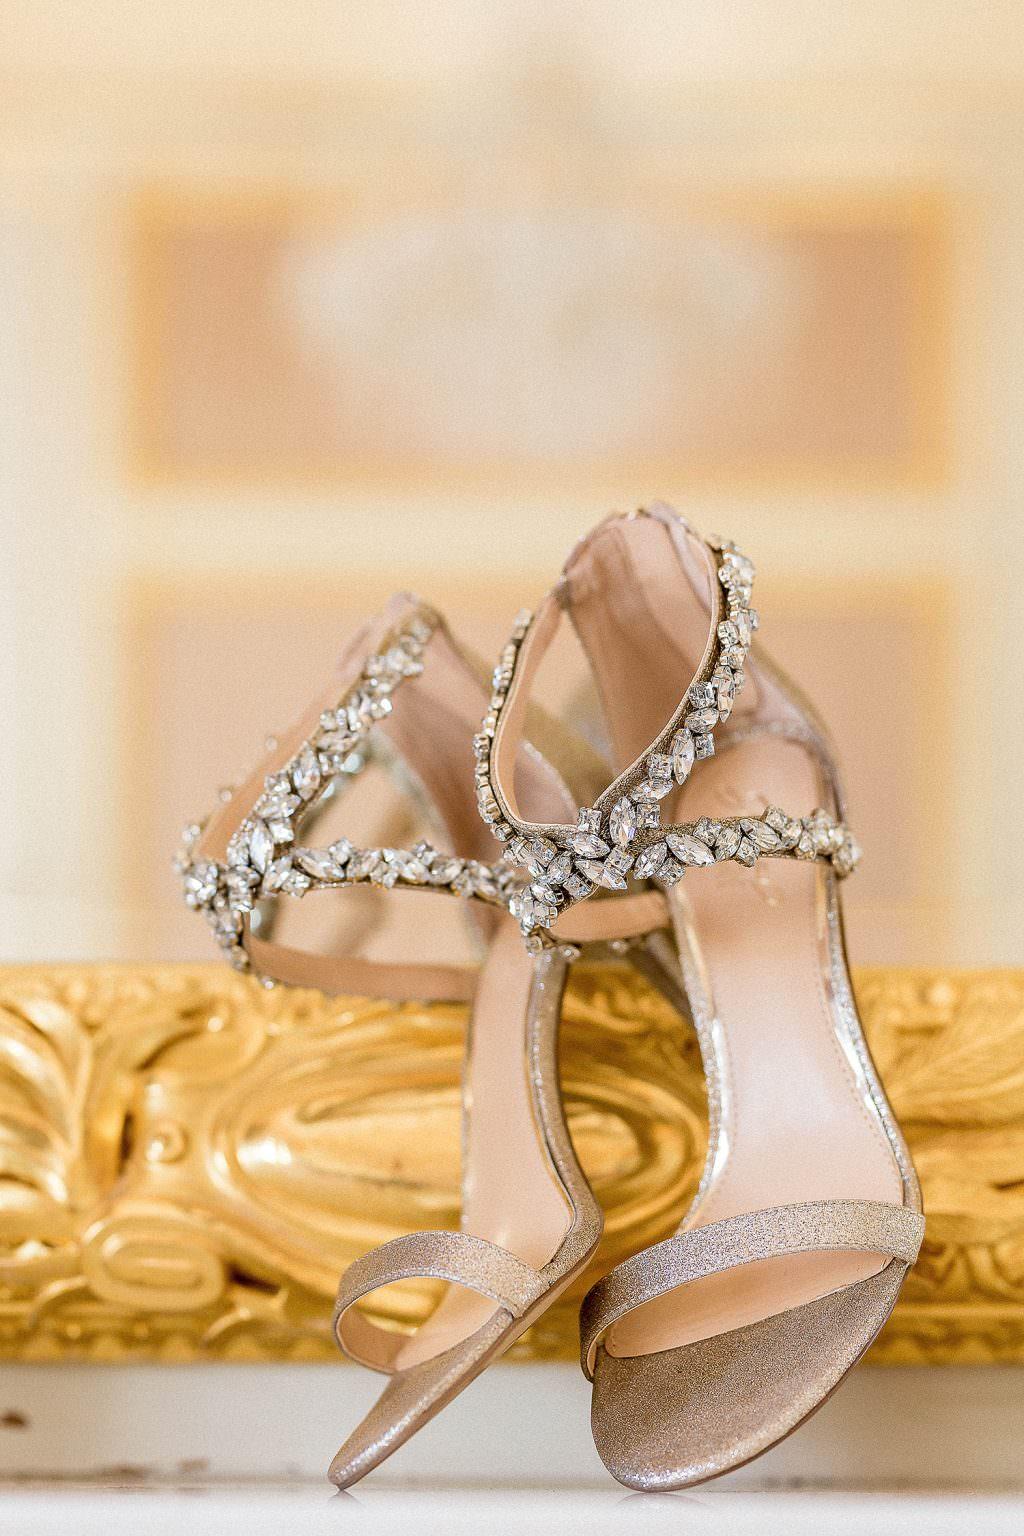 Chaussure mariée- Alliance Rêvée